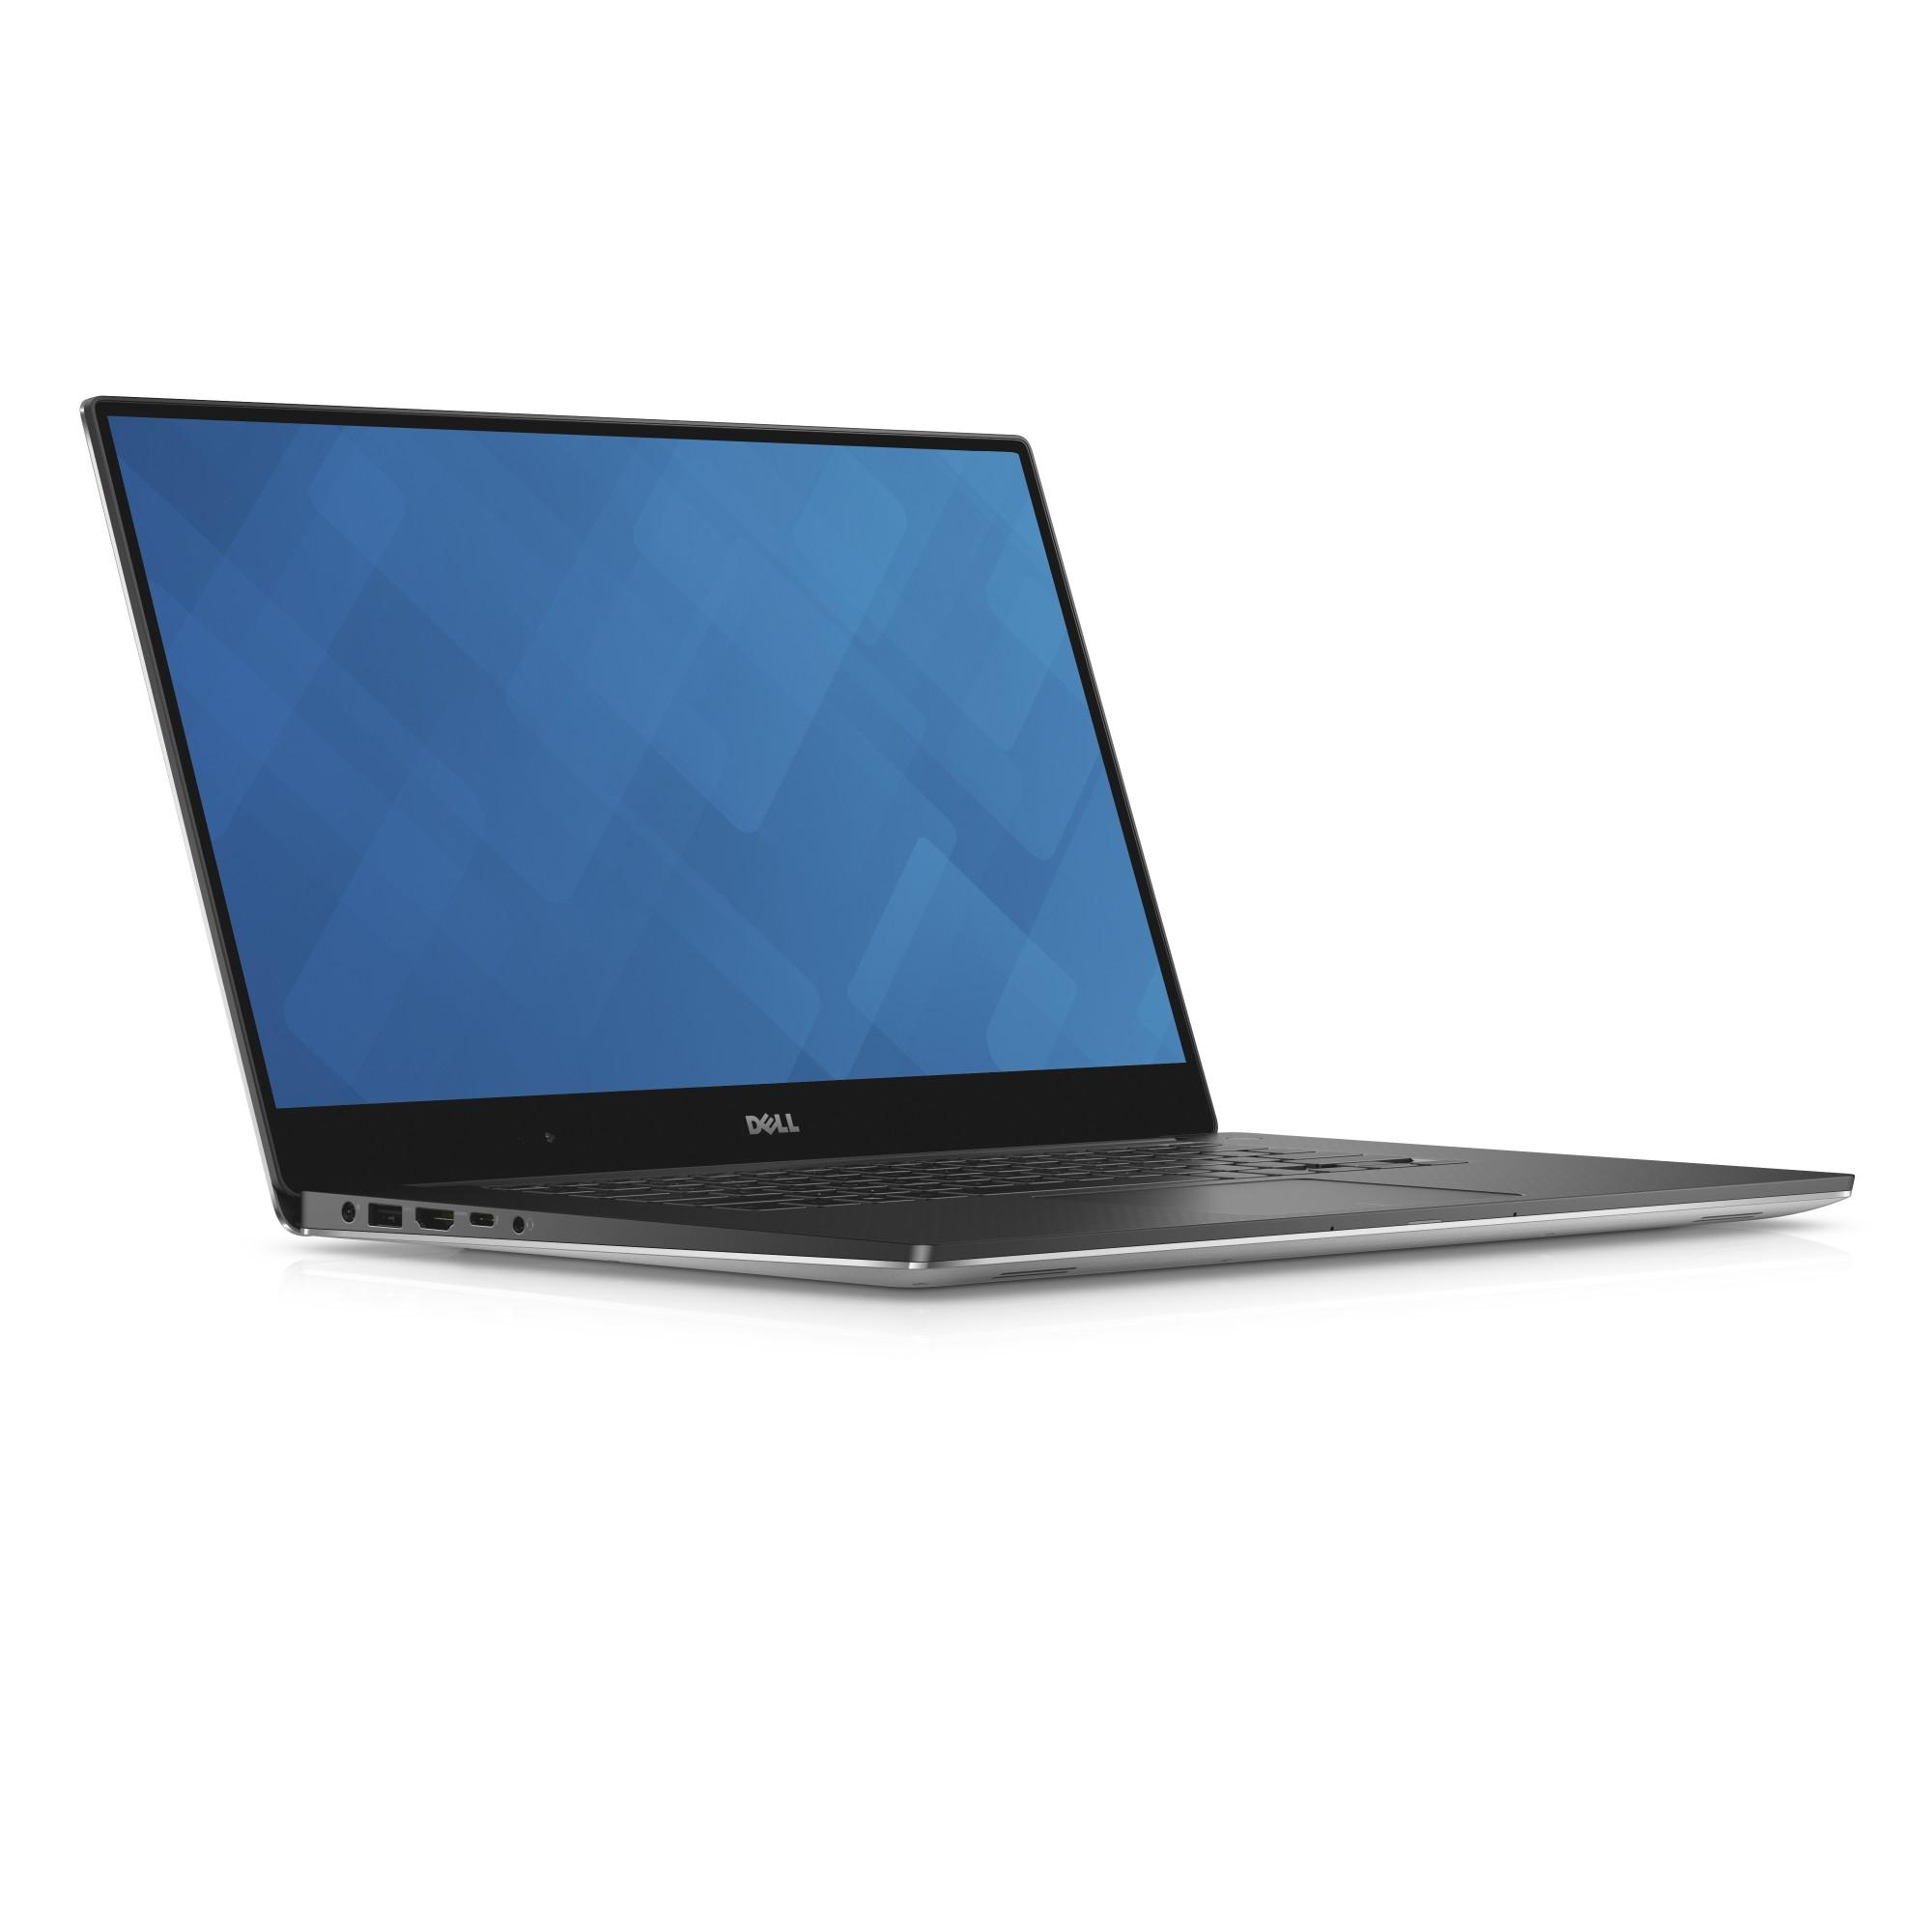 "DELL XPS 9560 2.5GHz i5-7300HQ 15.6"" 1920 x 1080pixels Black,Silver Notebook"